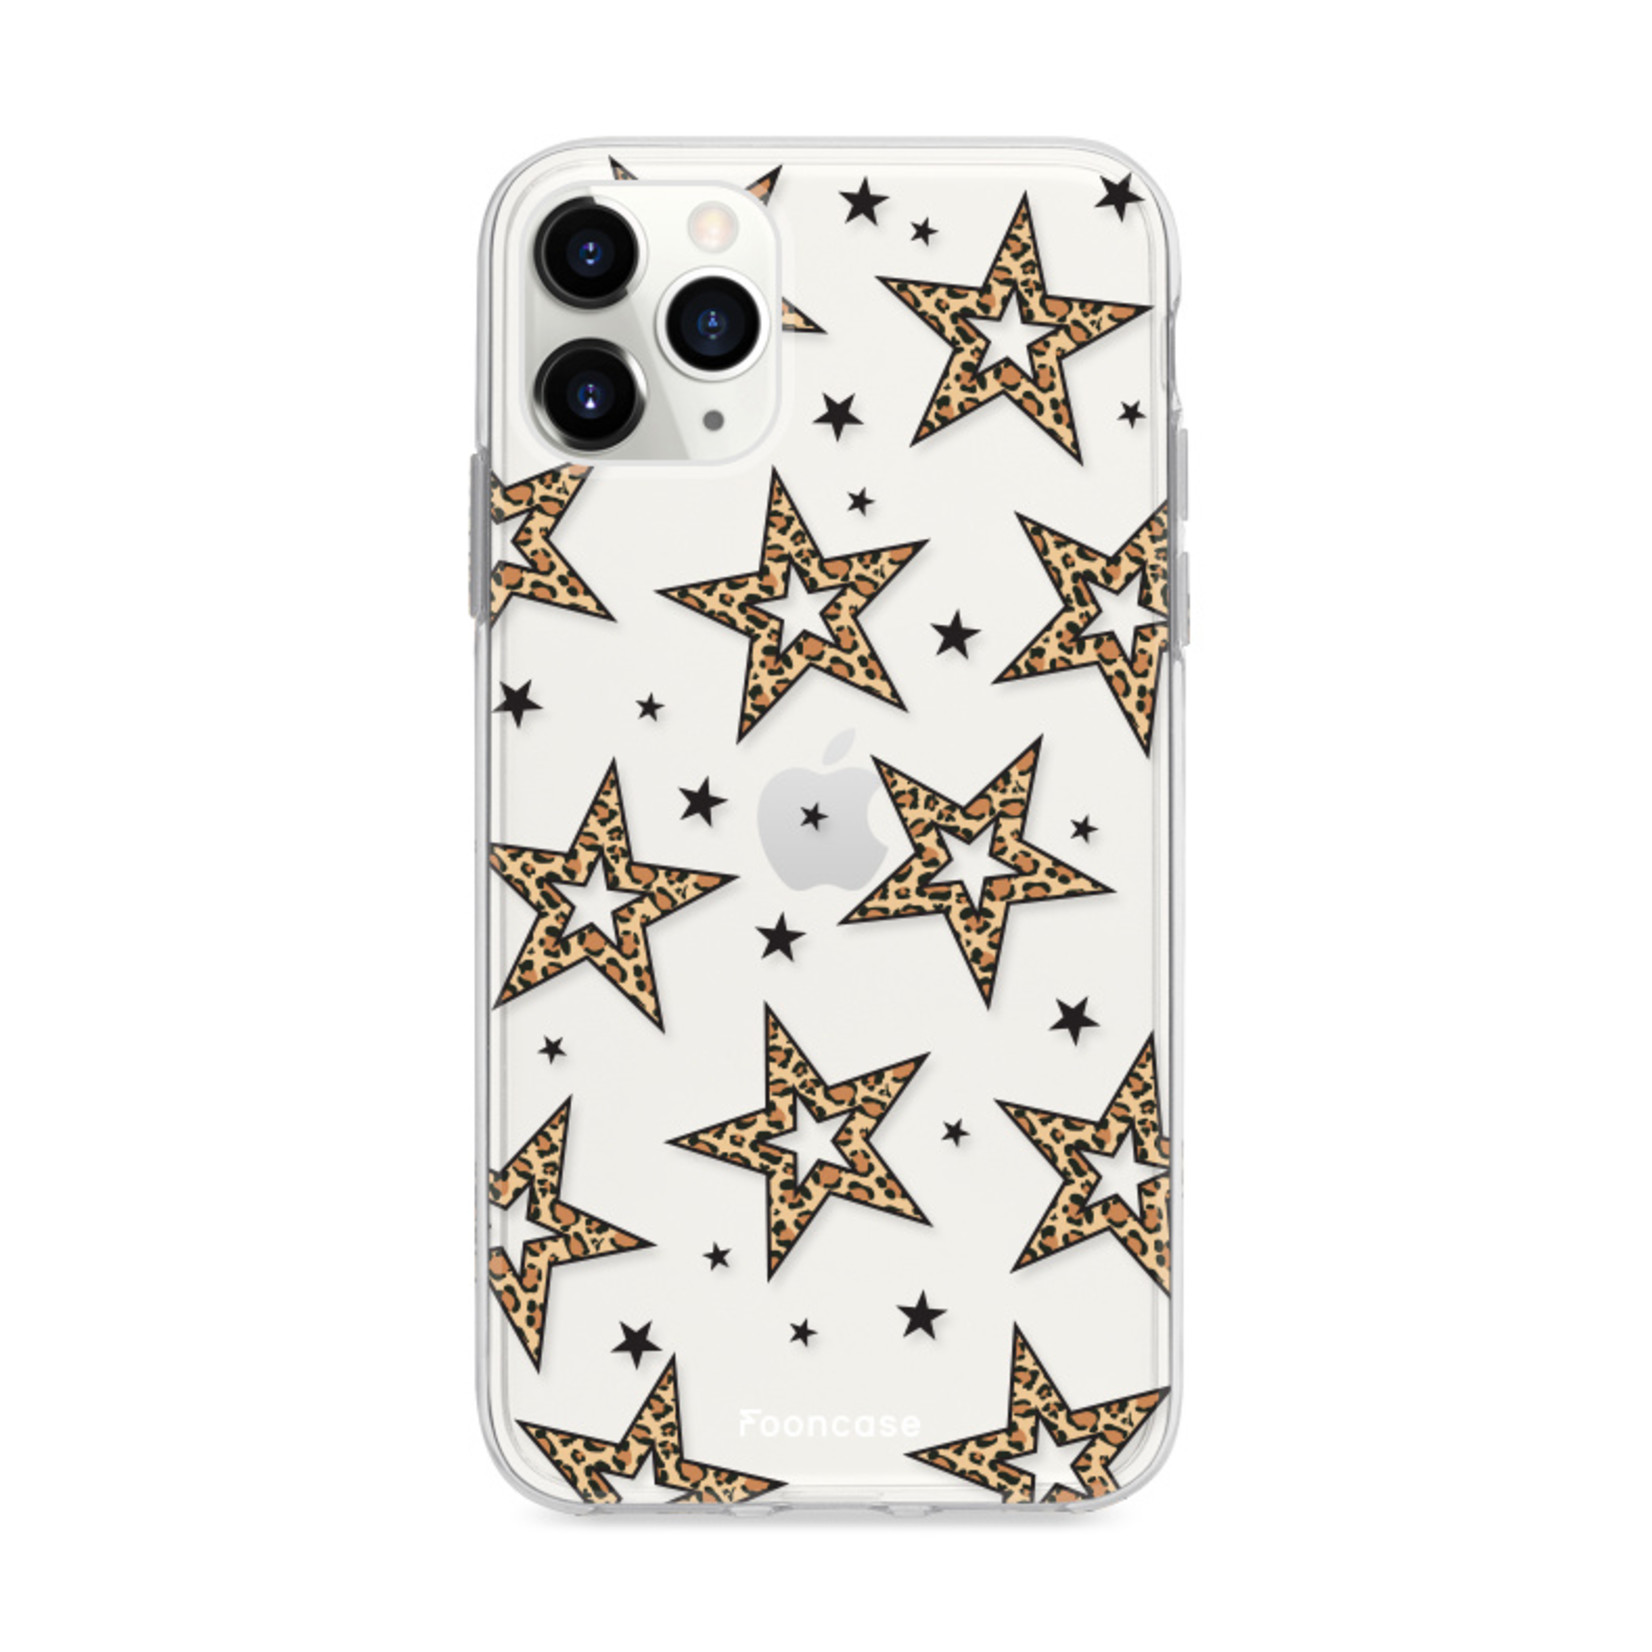 IPhone 11 Pro Handyhülle - Rebell Stars Transparent